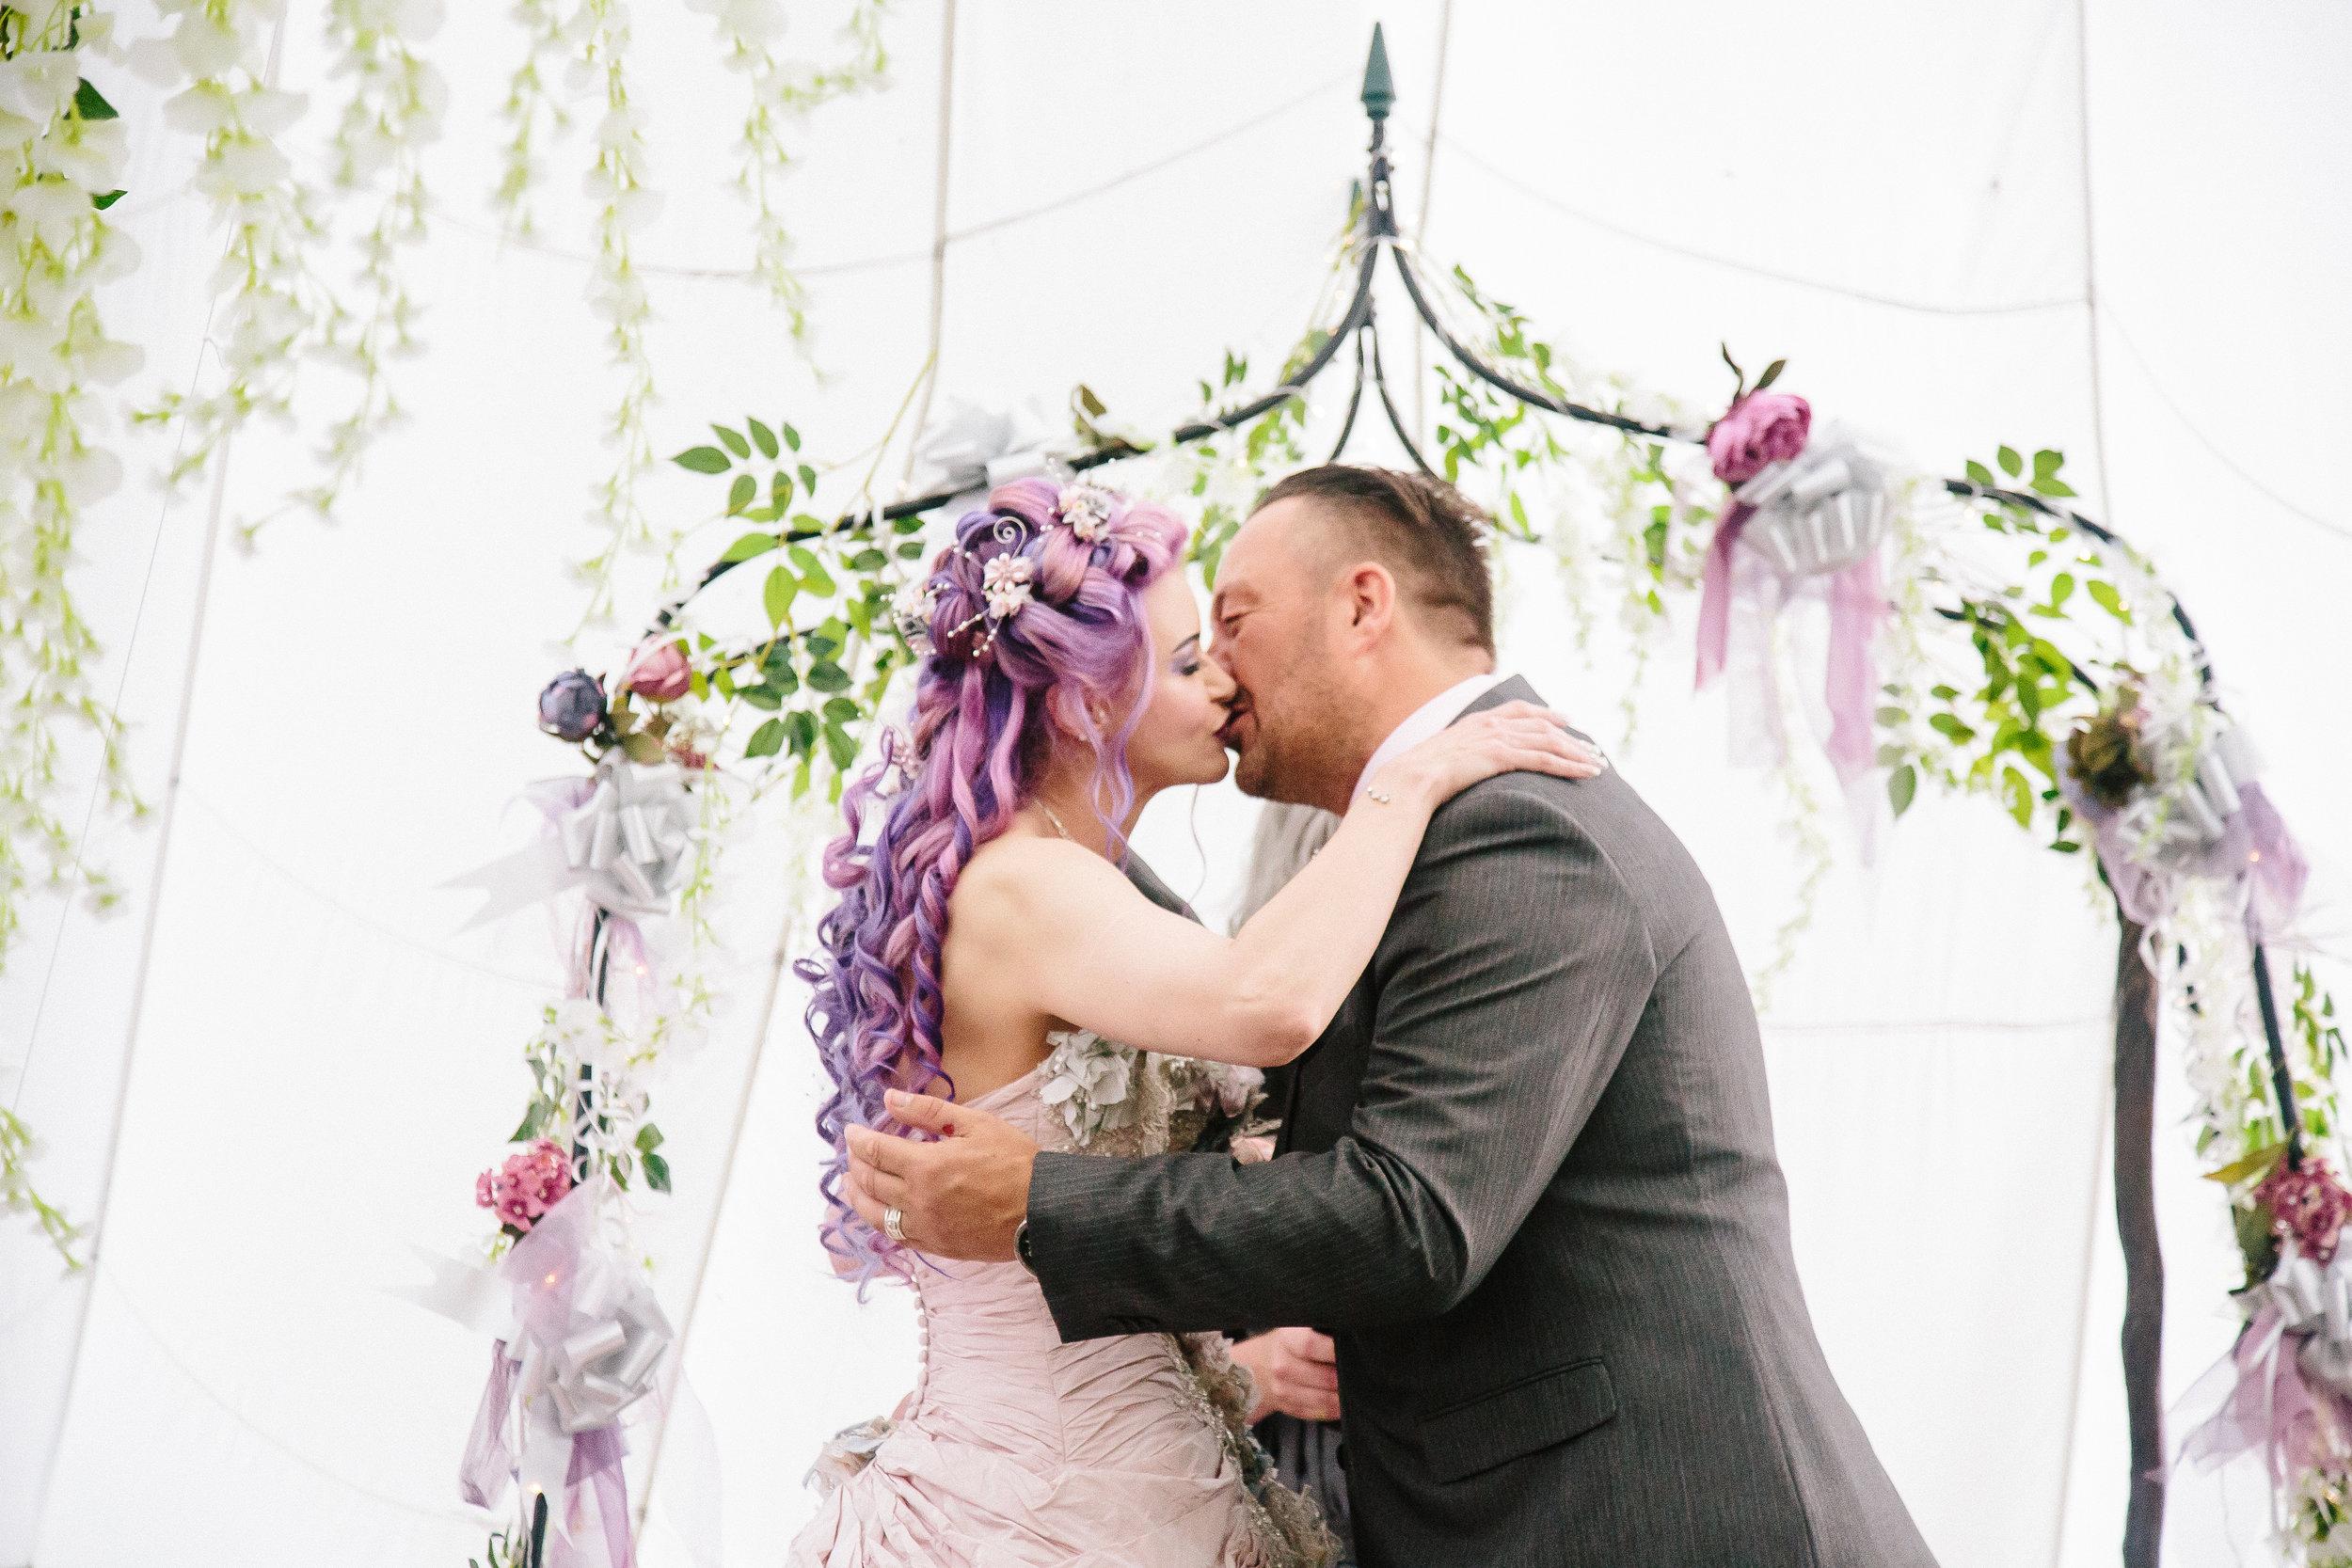 first-kiss-ceremony-bride-essex-movie-theme-wedding-4